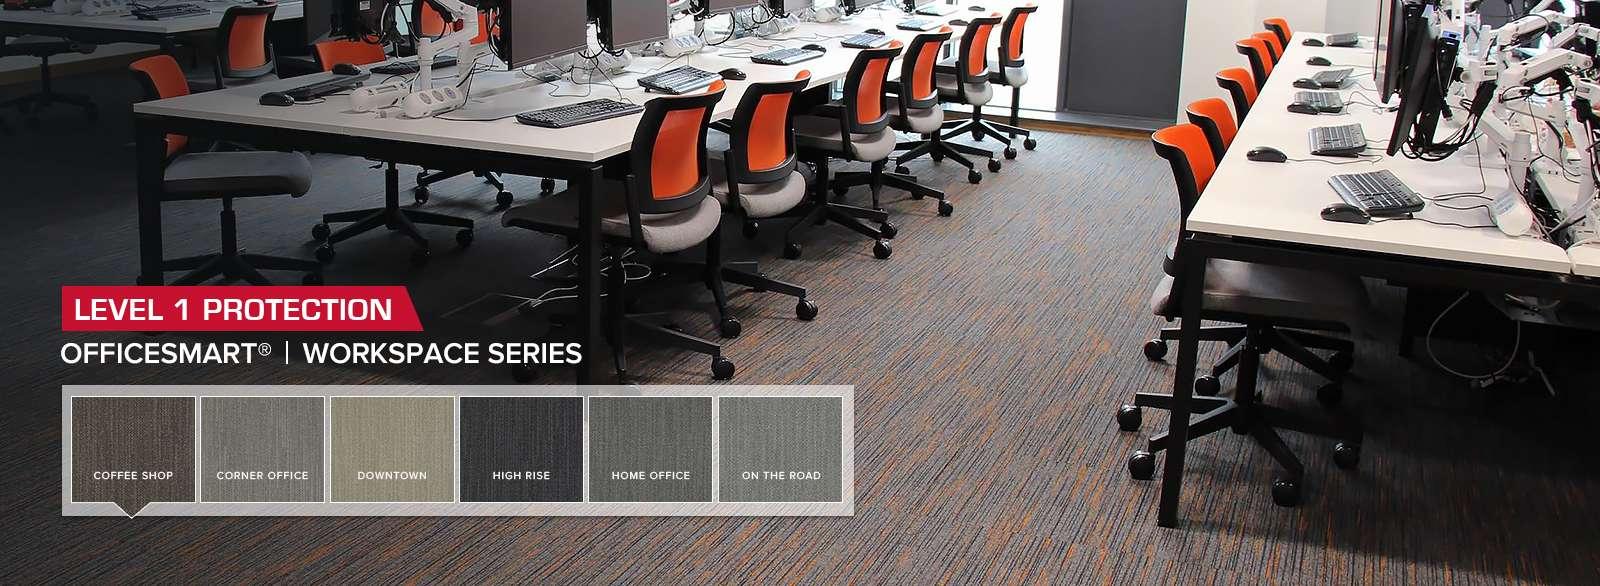 ESD Carpet Tile OfficeSmart Workspace Series